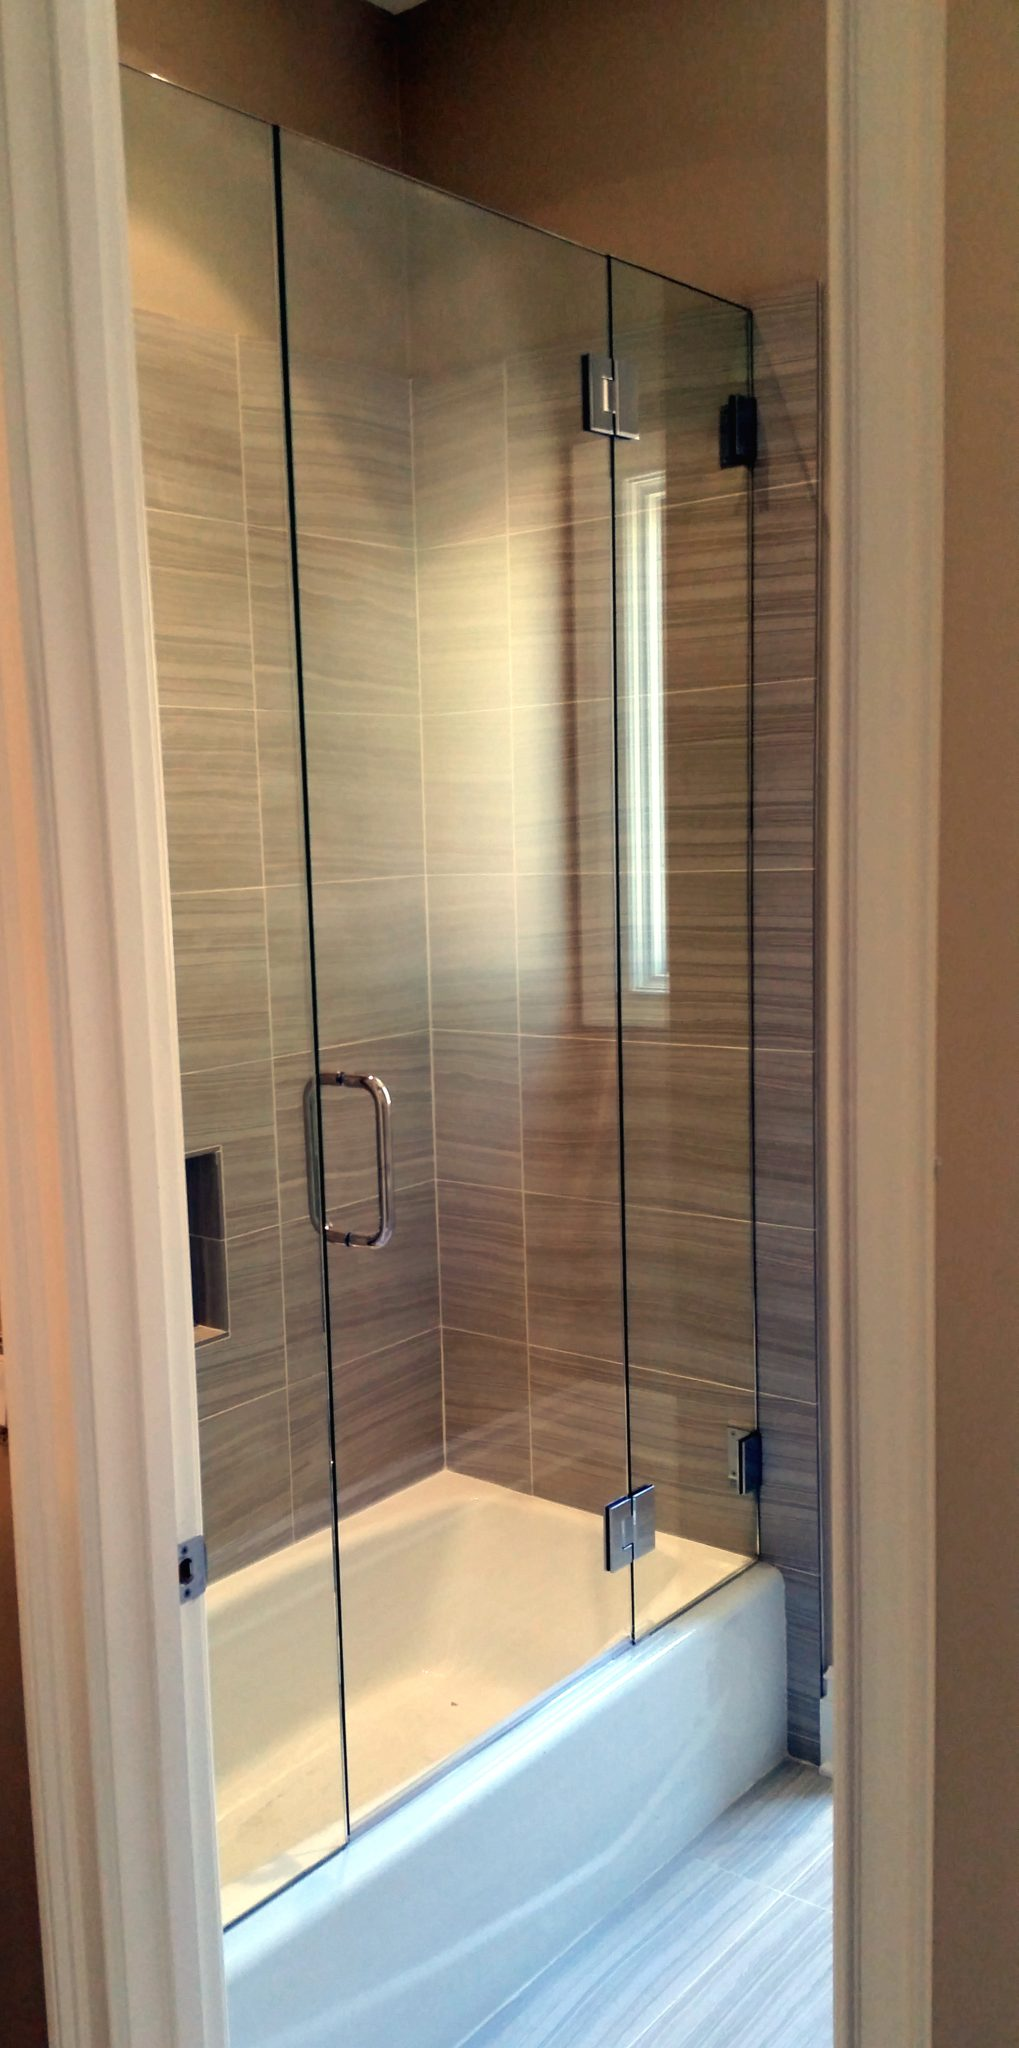 28 frameless shower doors phoenix phoenix twin frameless for Frameless shower doors cost